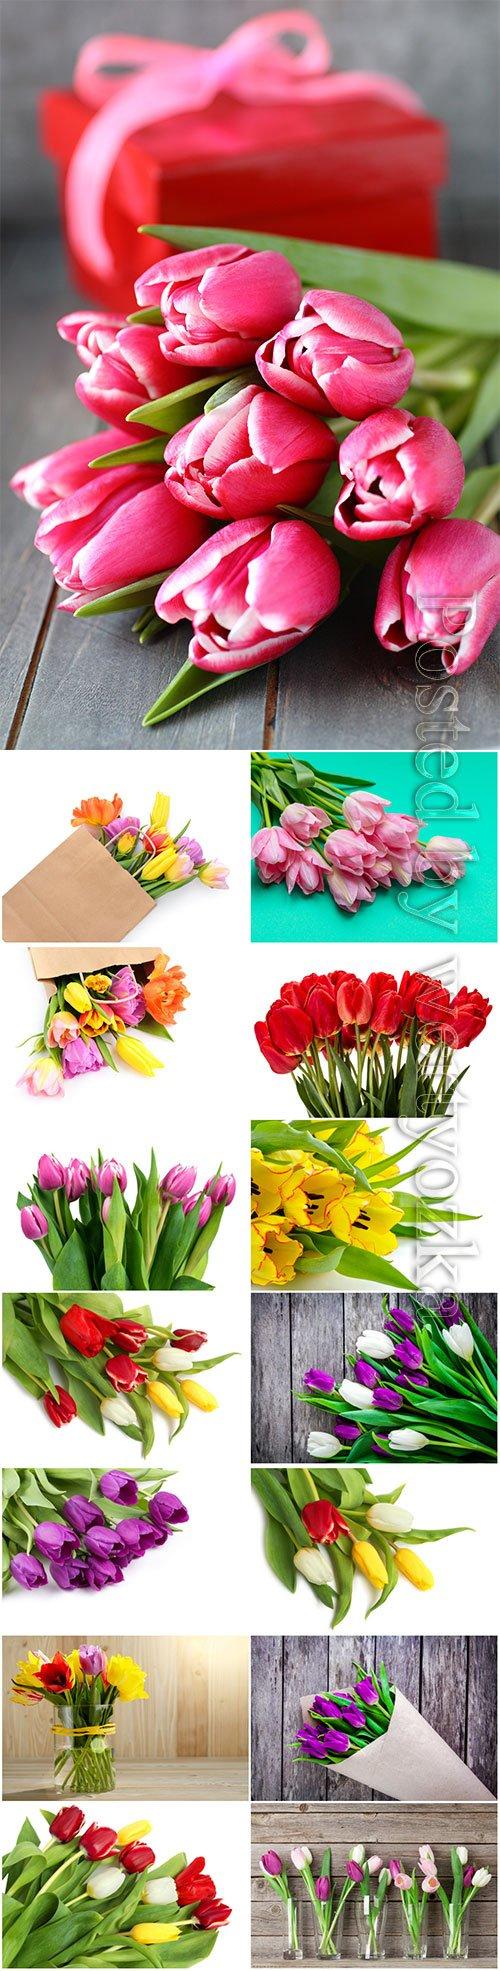 Colorful tulips beautiful stock photo